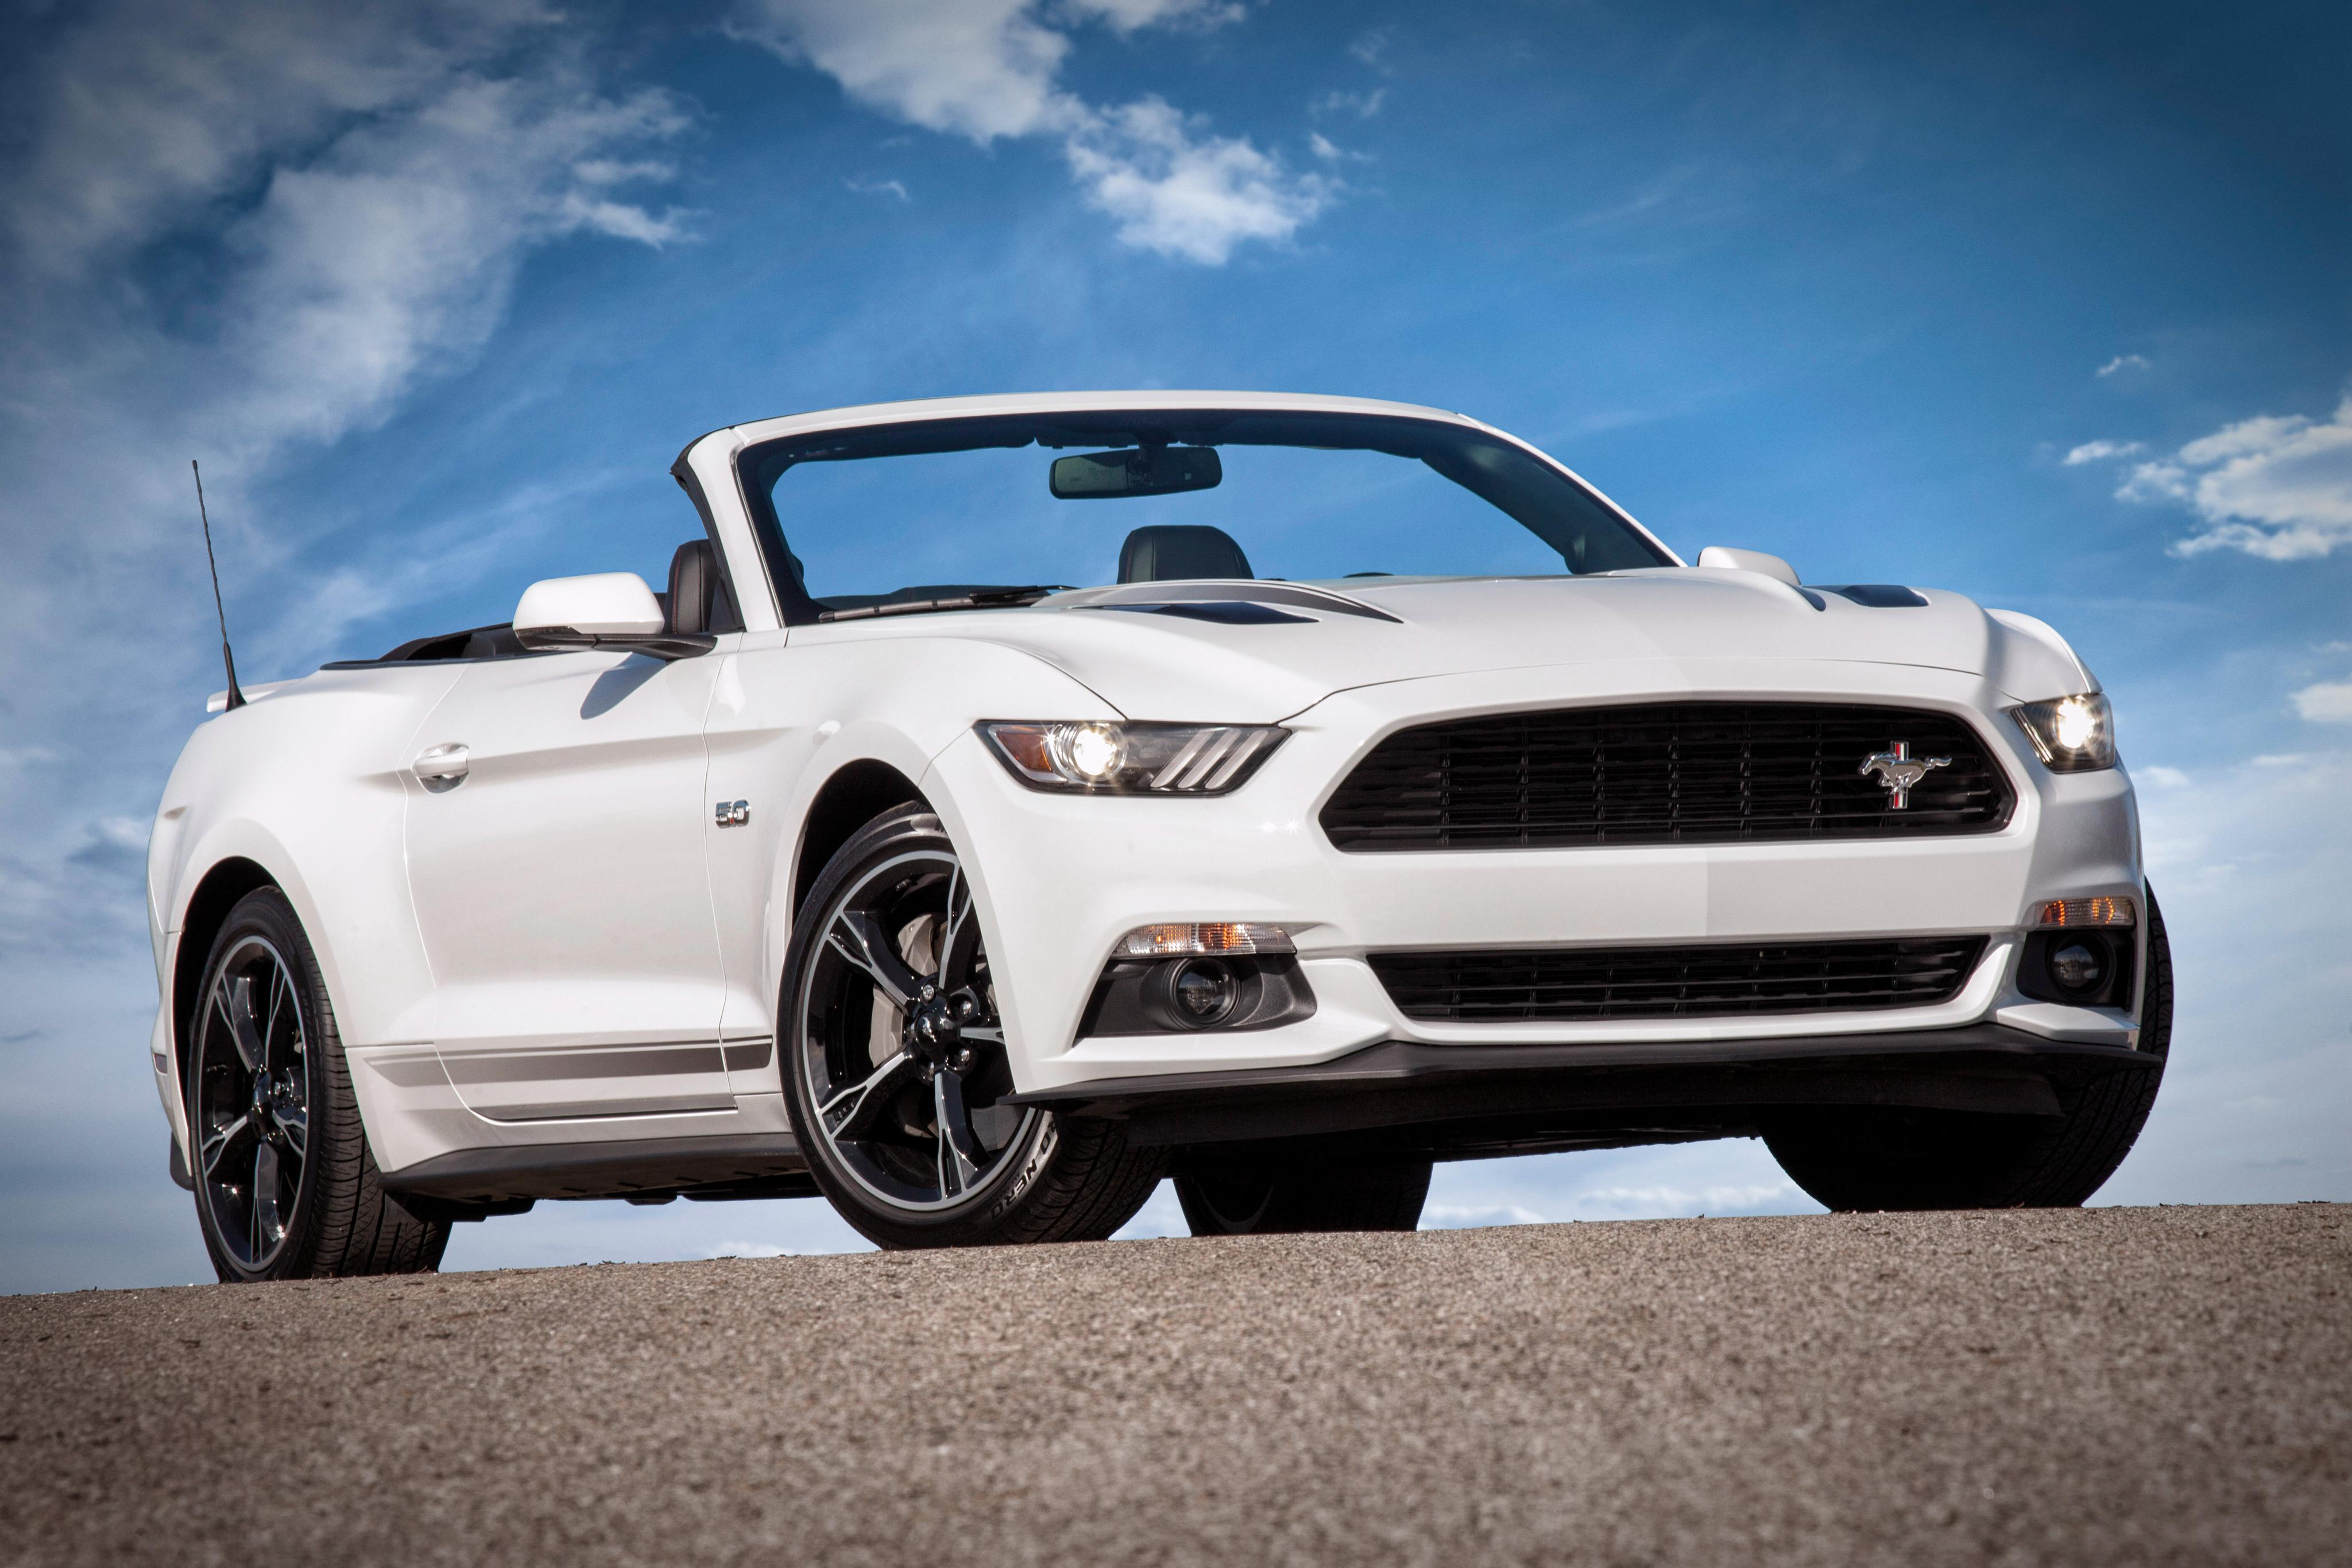 Ford Mustang (2016-2017) цены и характеристики, фотографии ...